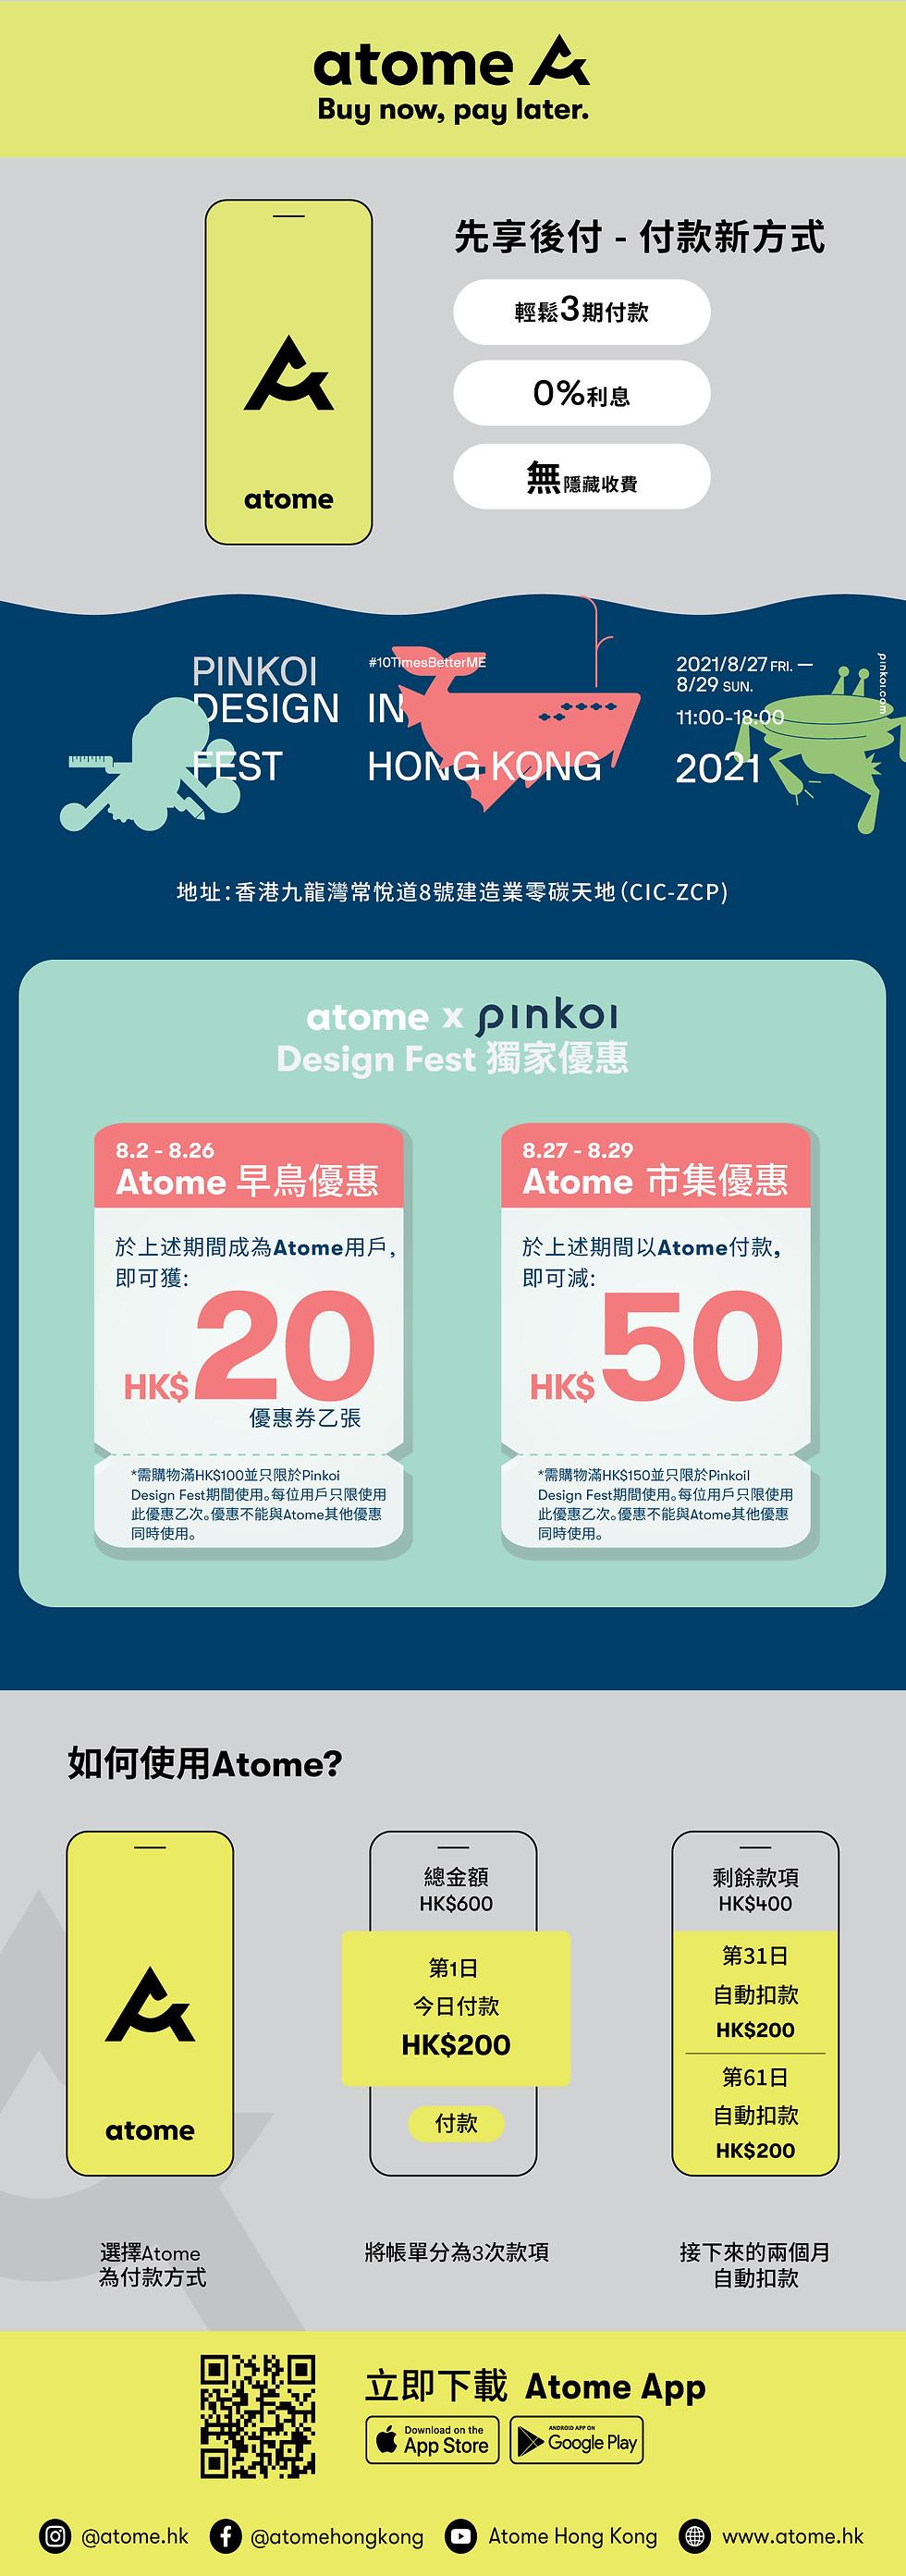 [New] Pinkoi LP 210802.jpeg